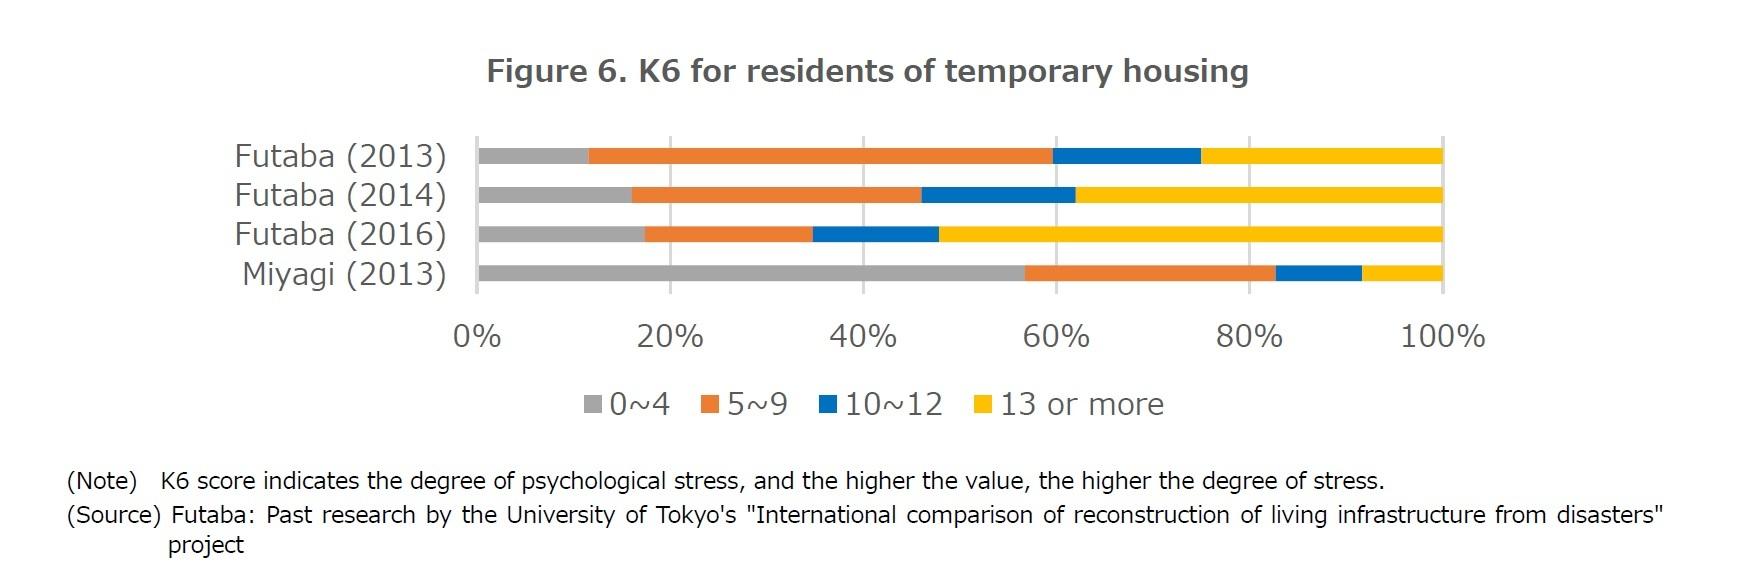 Figure 6. K6 for residents of temporary housing